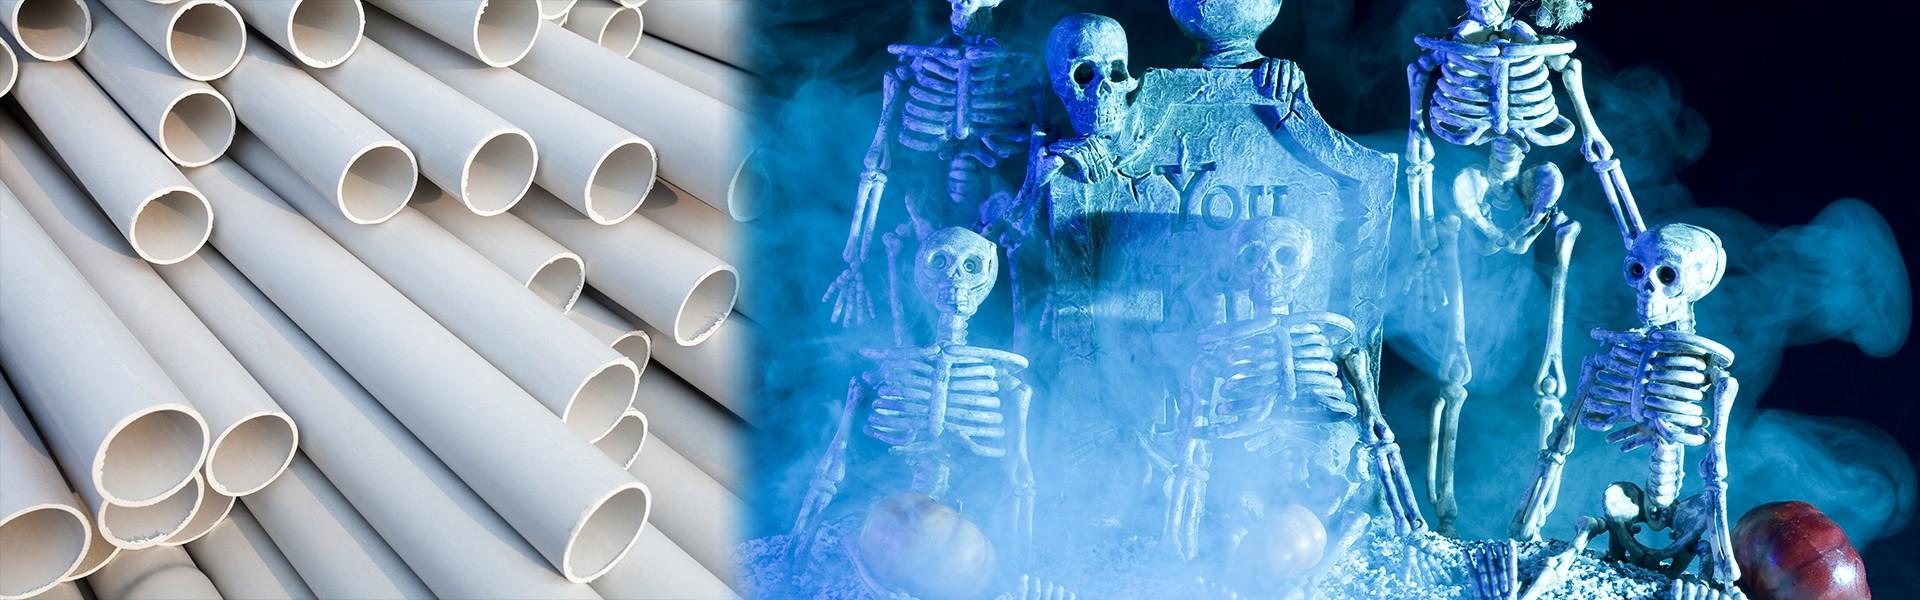 pvc pipe skeletons